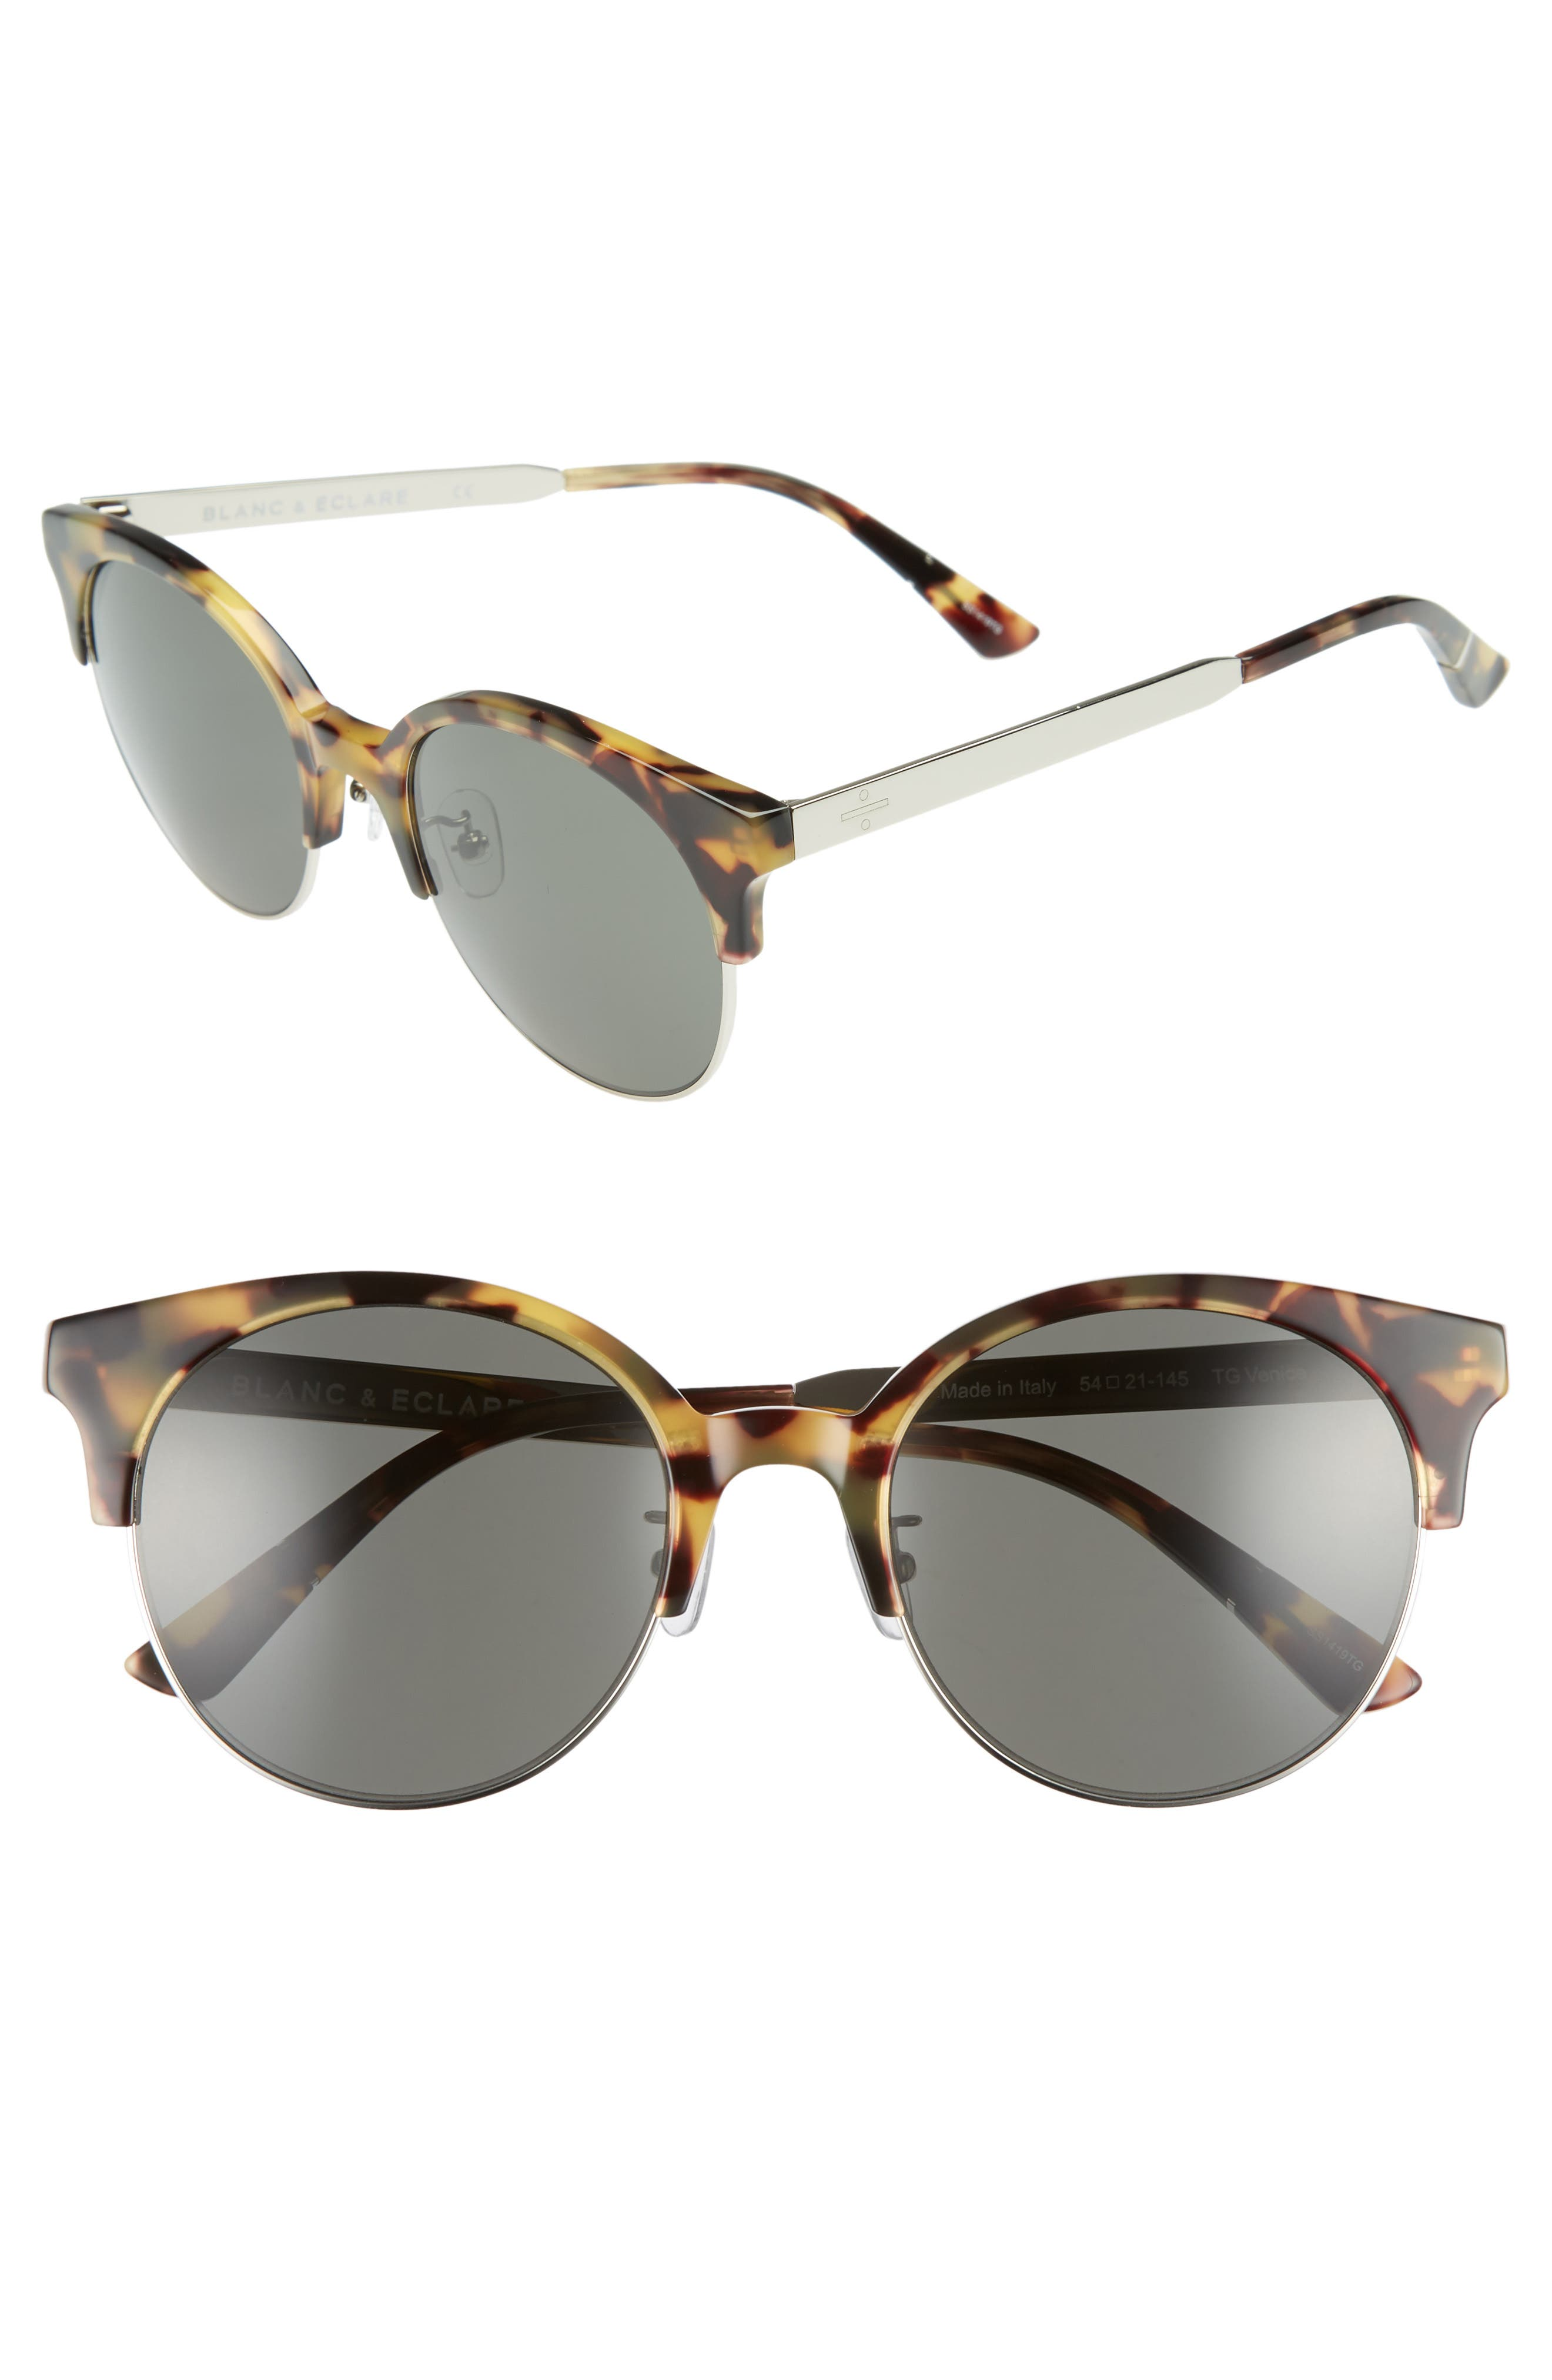 BLANC & ECLARE Venice Round Sunglasses,                         Main,                         color, Tortoise/ Grey